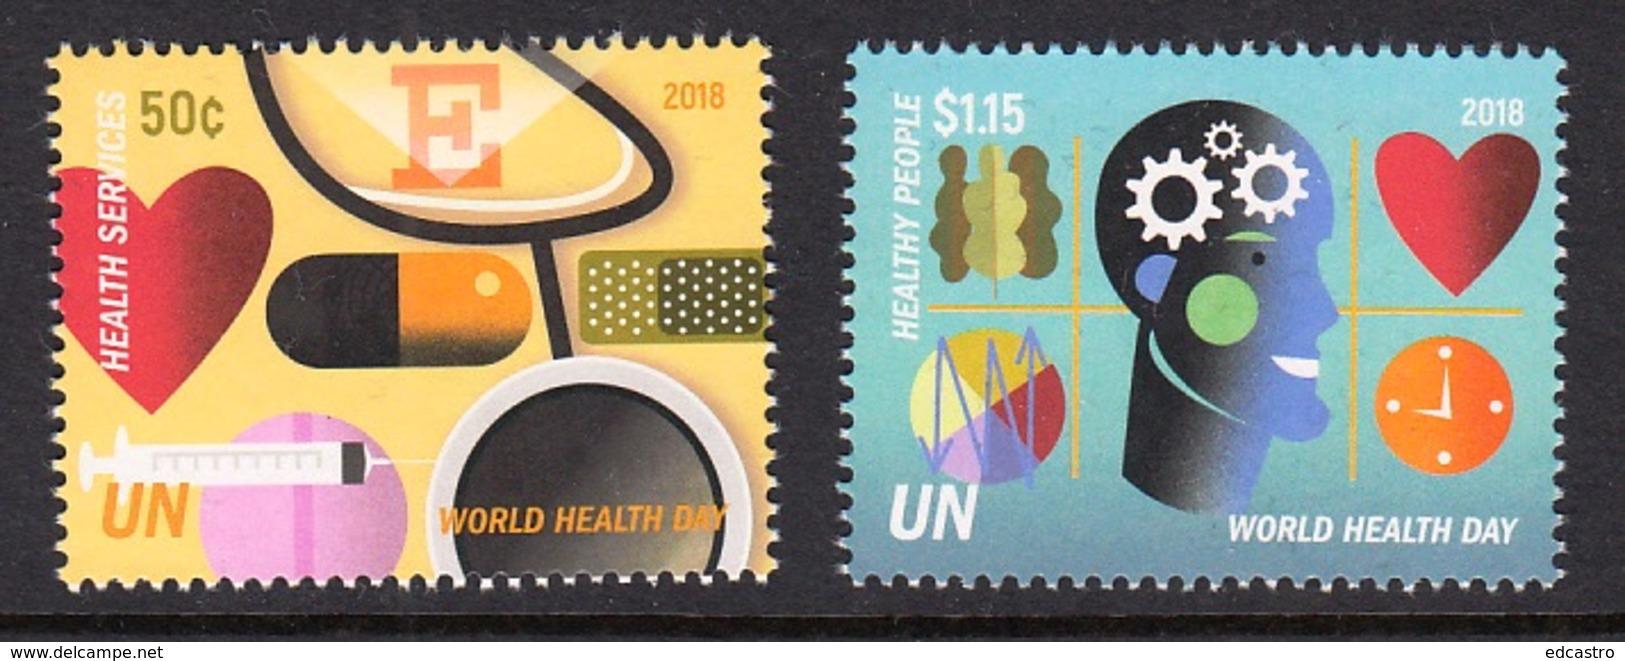 4.- UNITED NATIONS 2018 WORLD HEALTH DAY - Nuevos